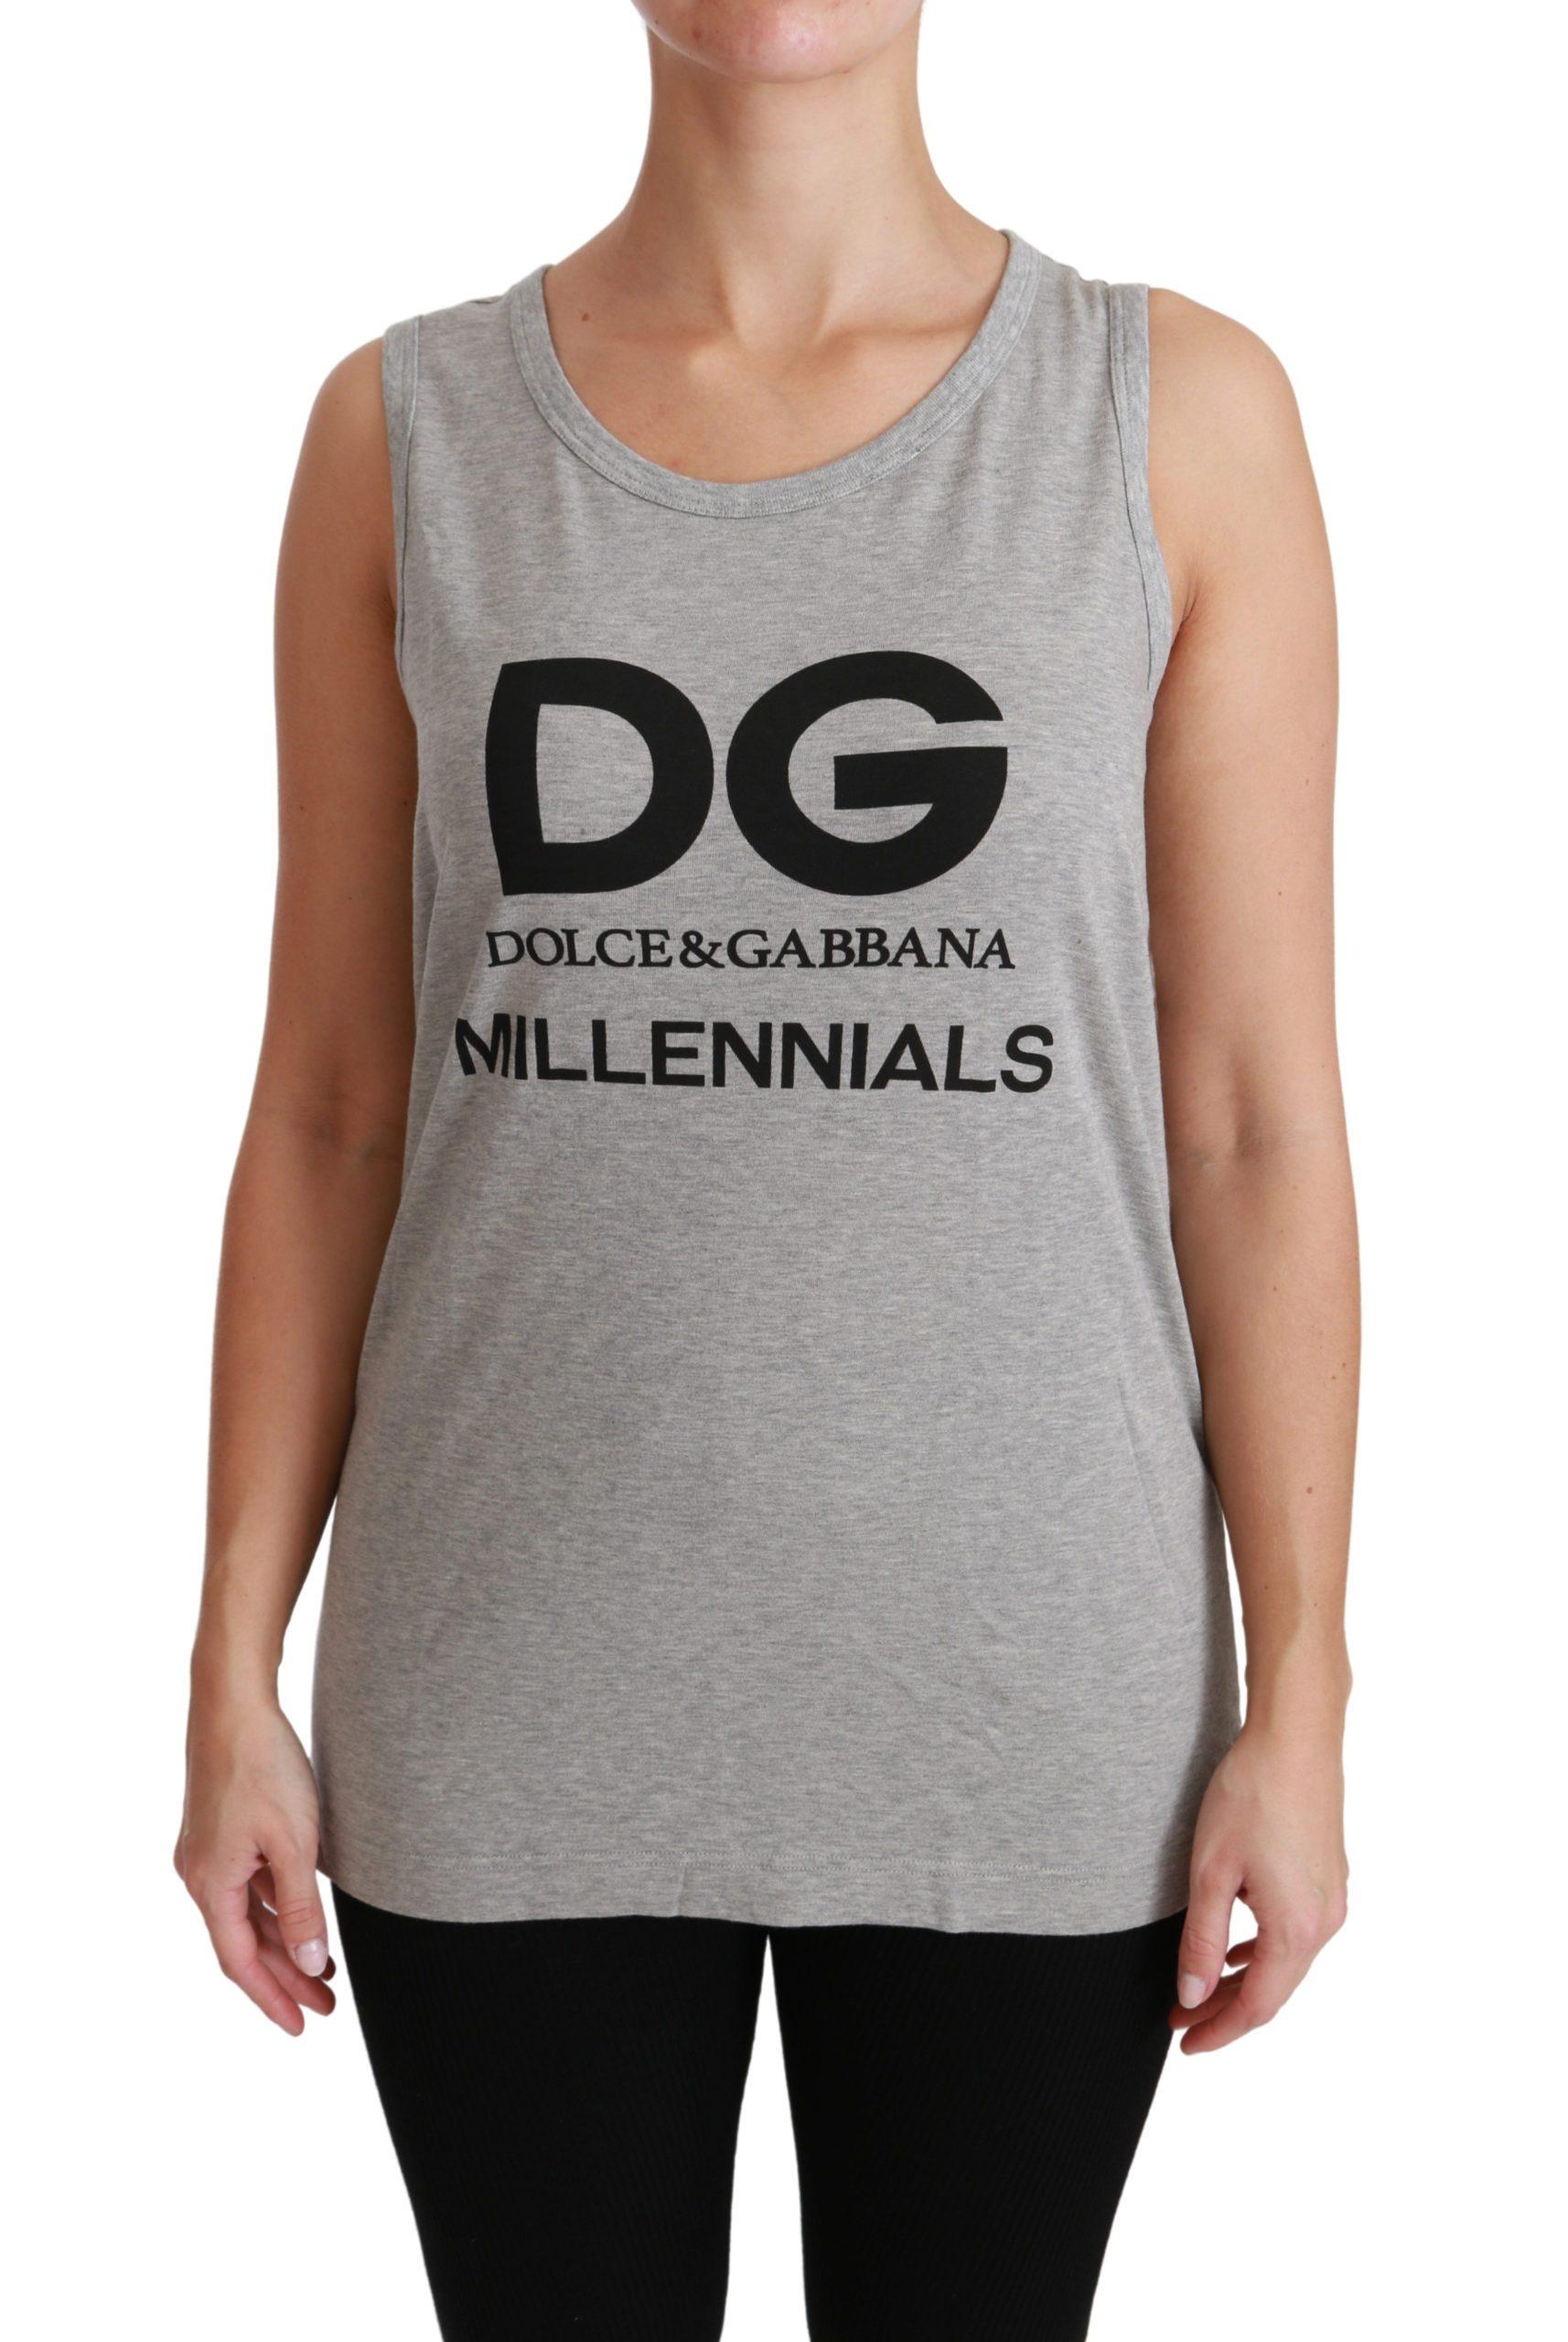 Dolce & Gabbana Women's DG Millennial Cotton T-Shirt Gray TSH4447 - IT36 | XS